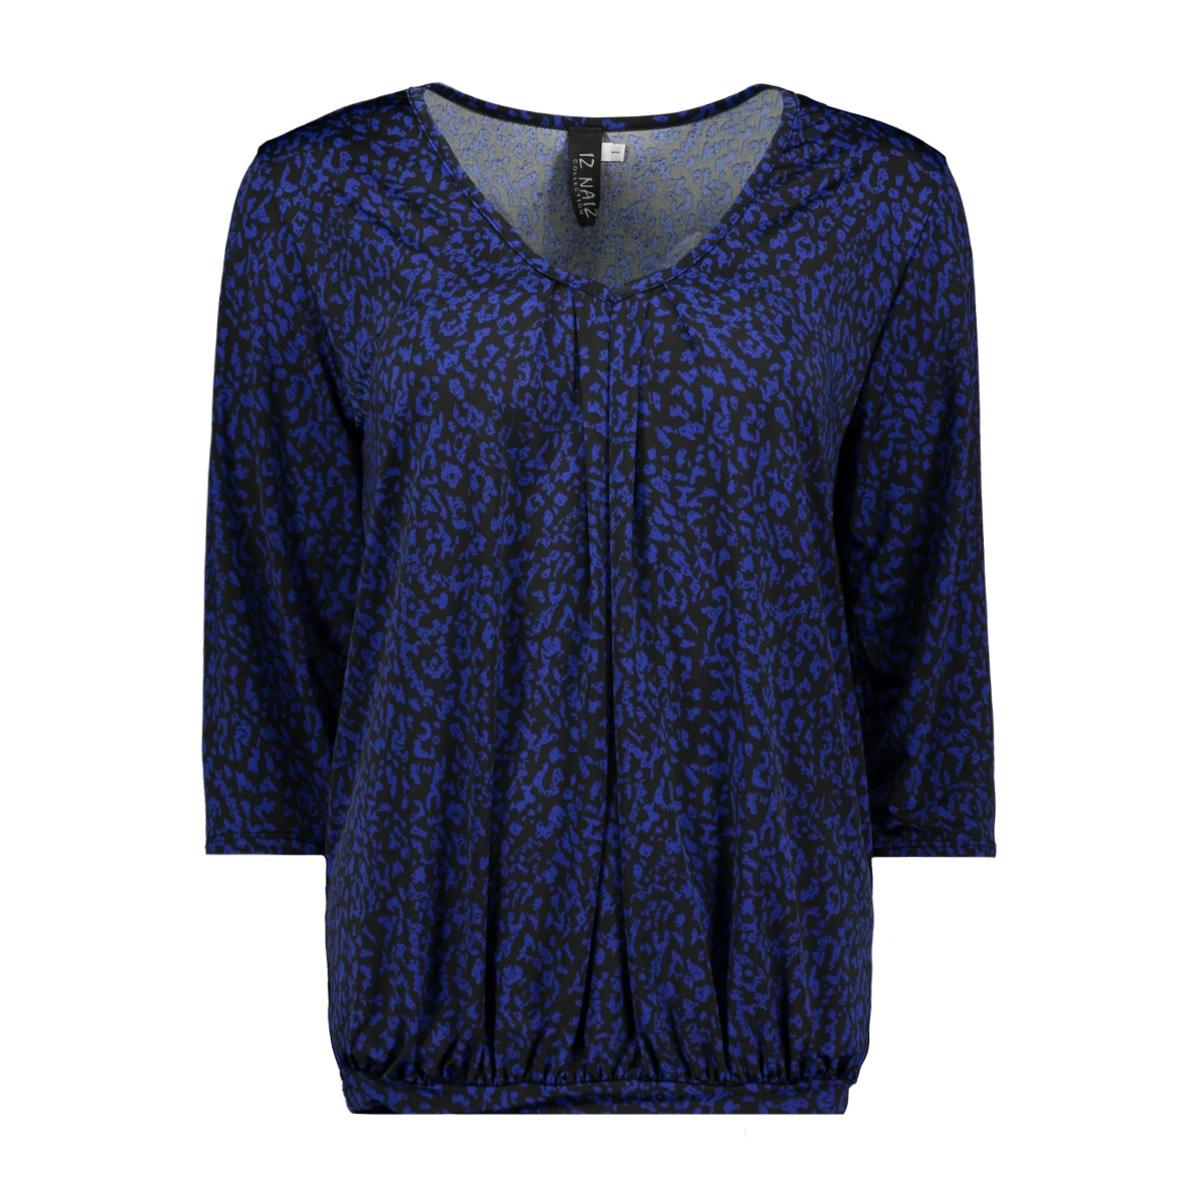 shirt 3/4 v-neck 3418 iz naiz t-shirt leo cobalt